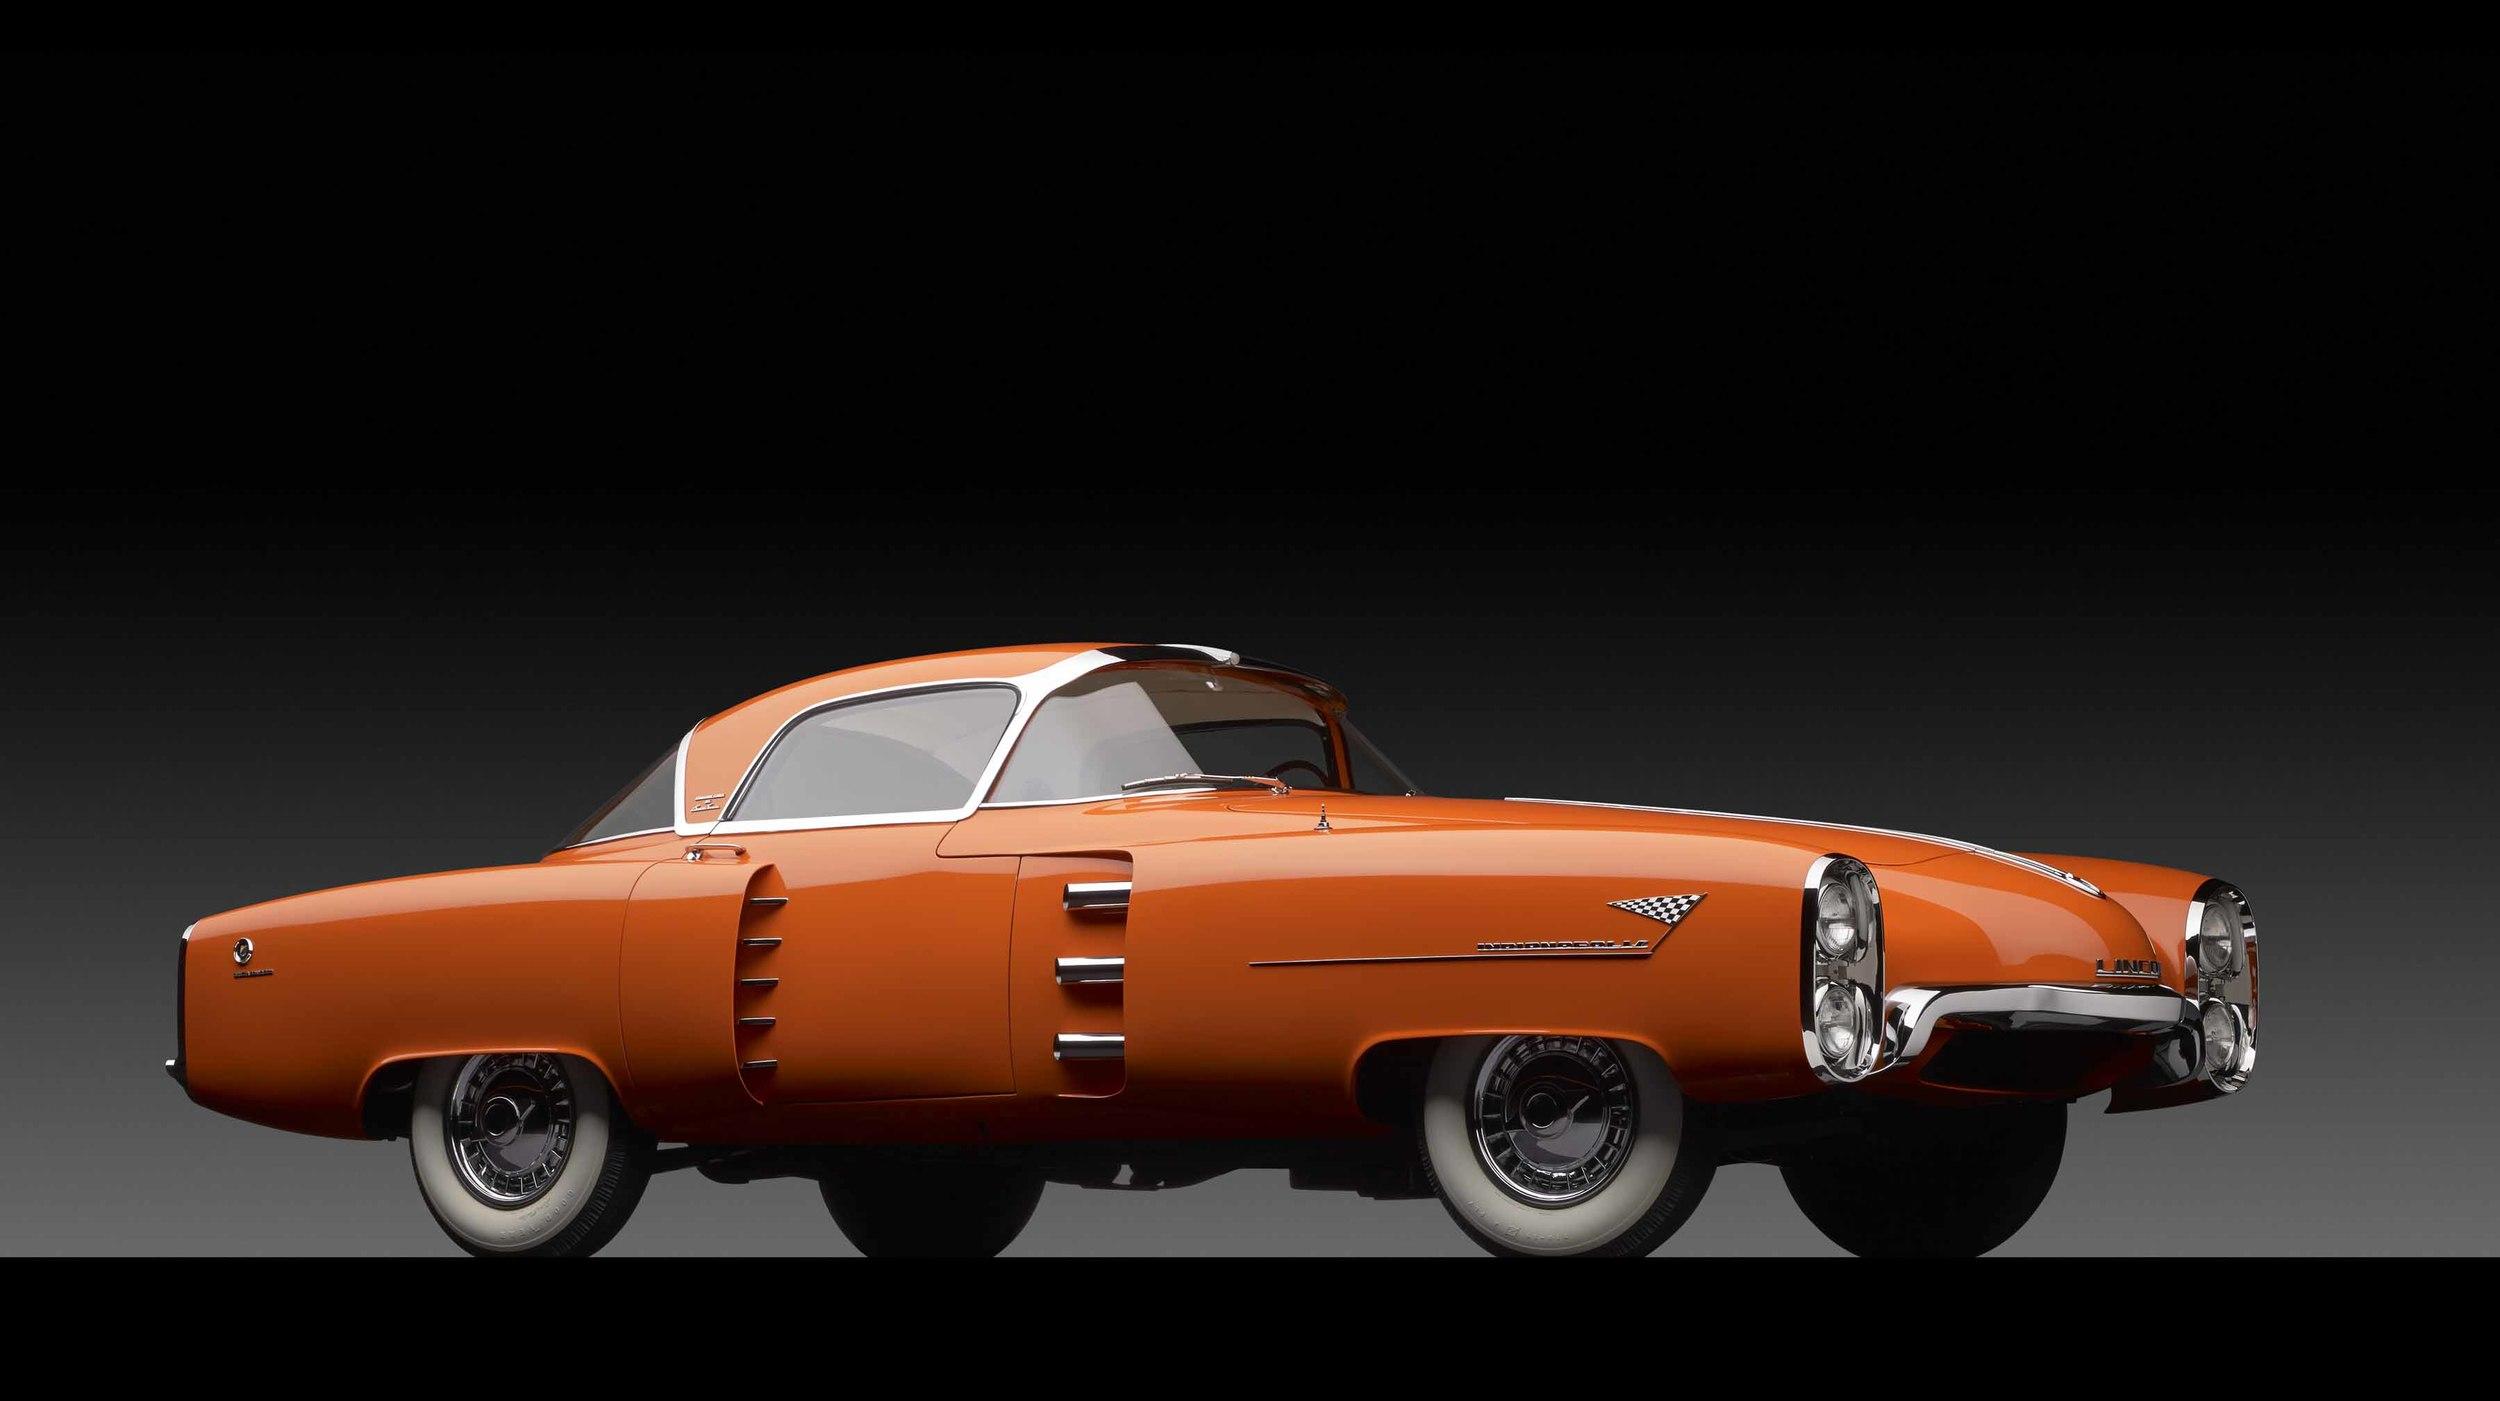 "NY13_r107_01_img_alt=""lincoln idianapolis executive study the art of the automobile the car crush"".jpg"